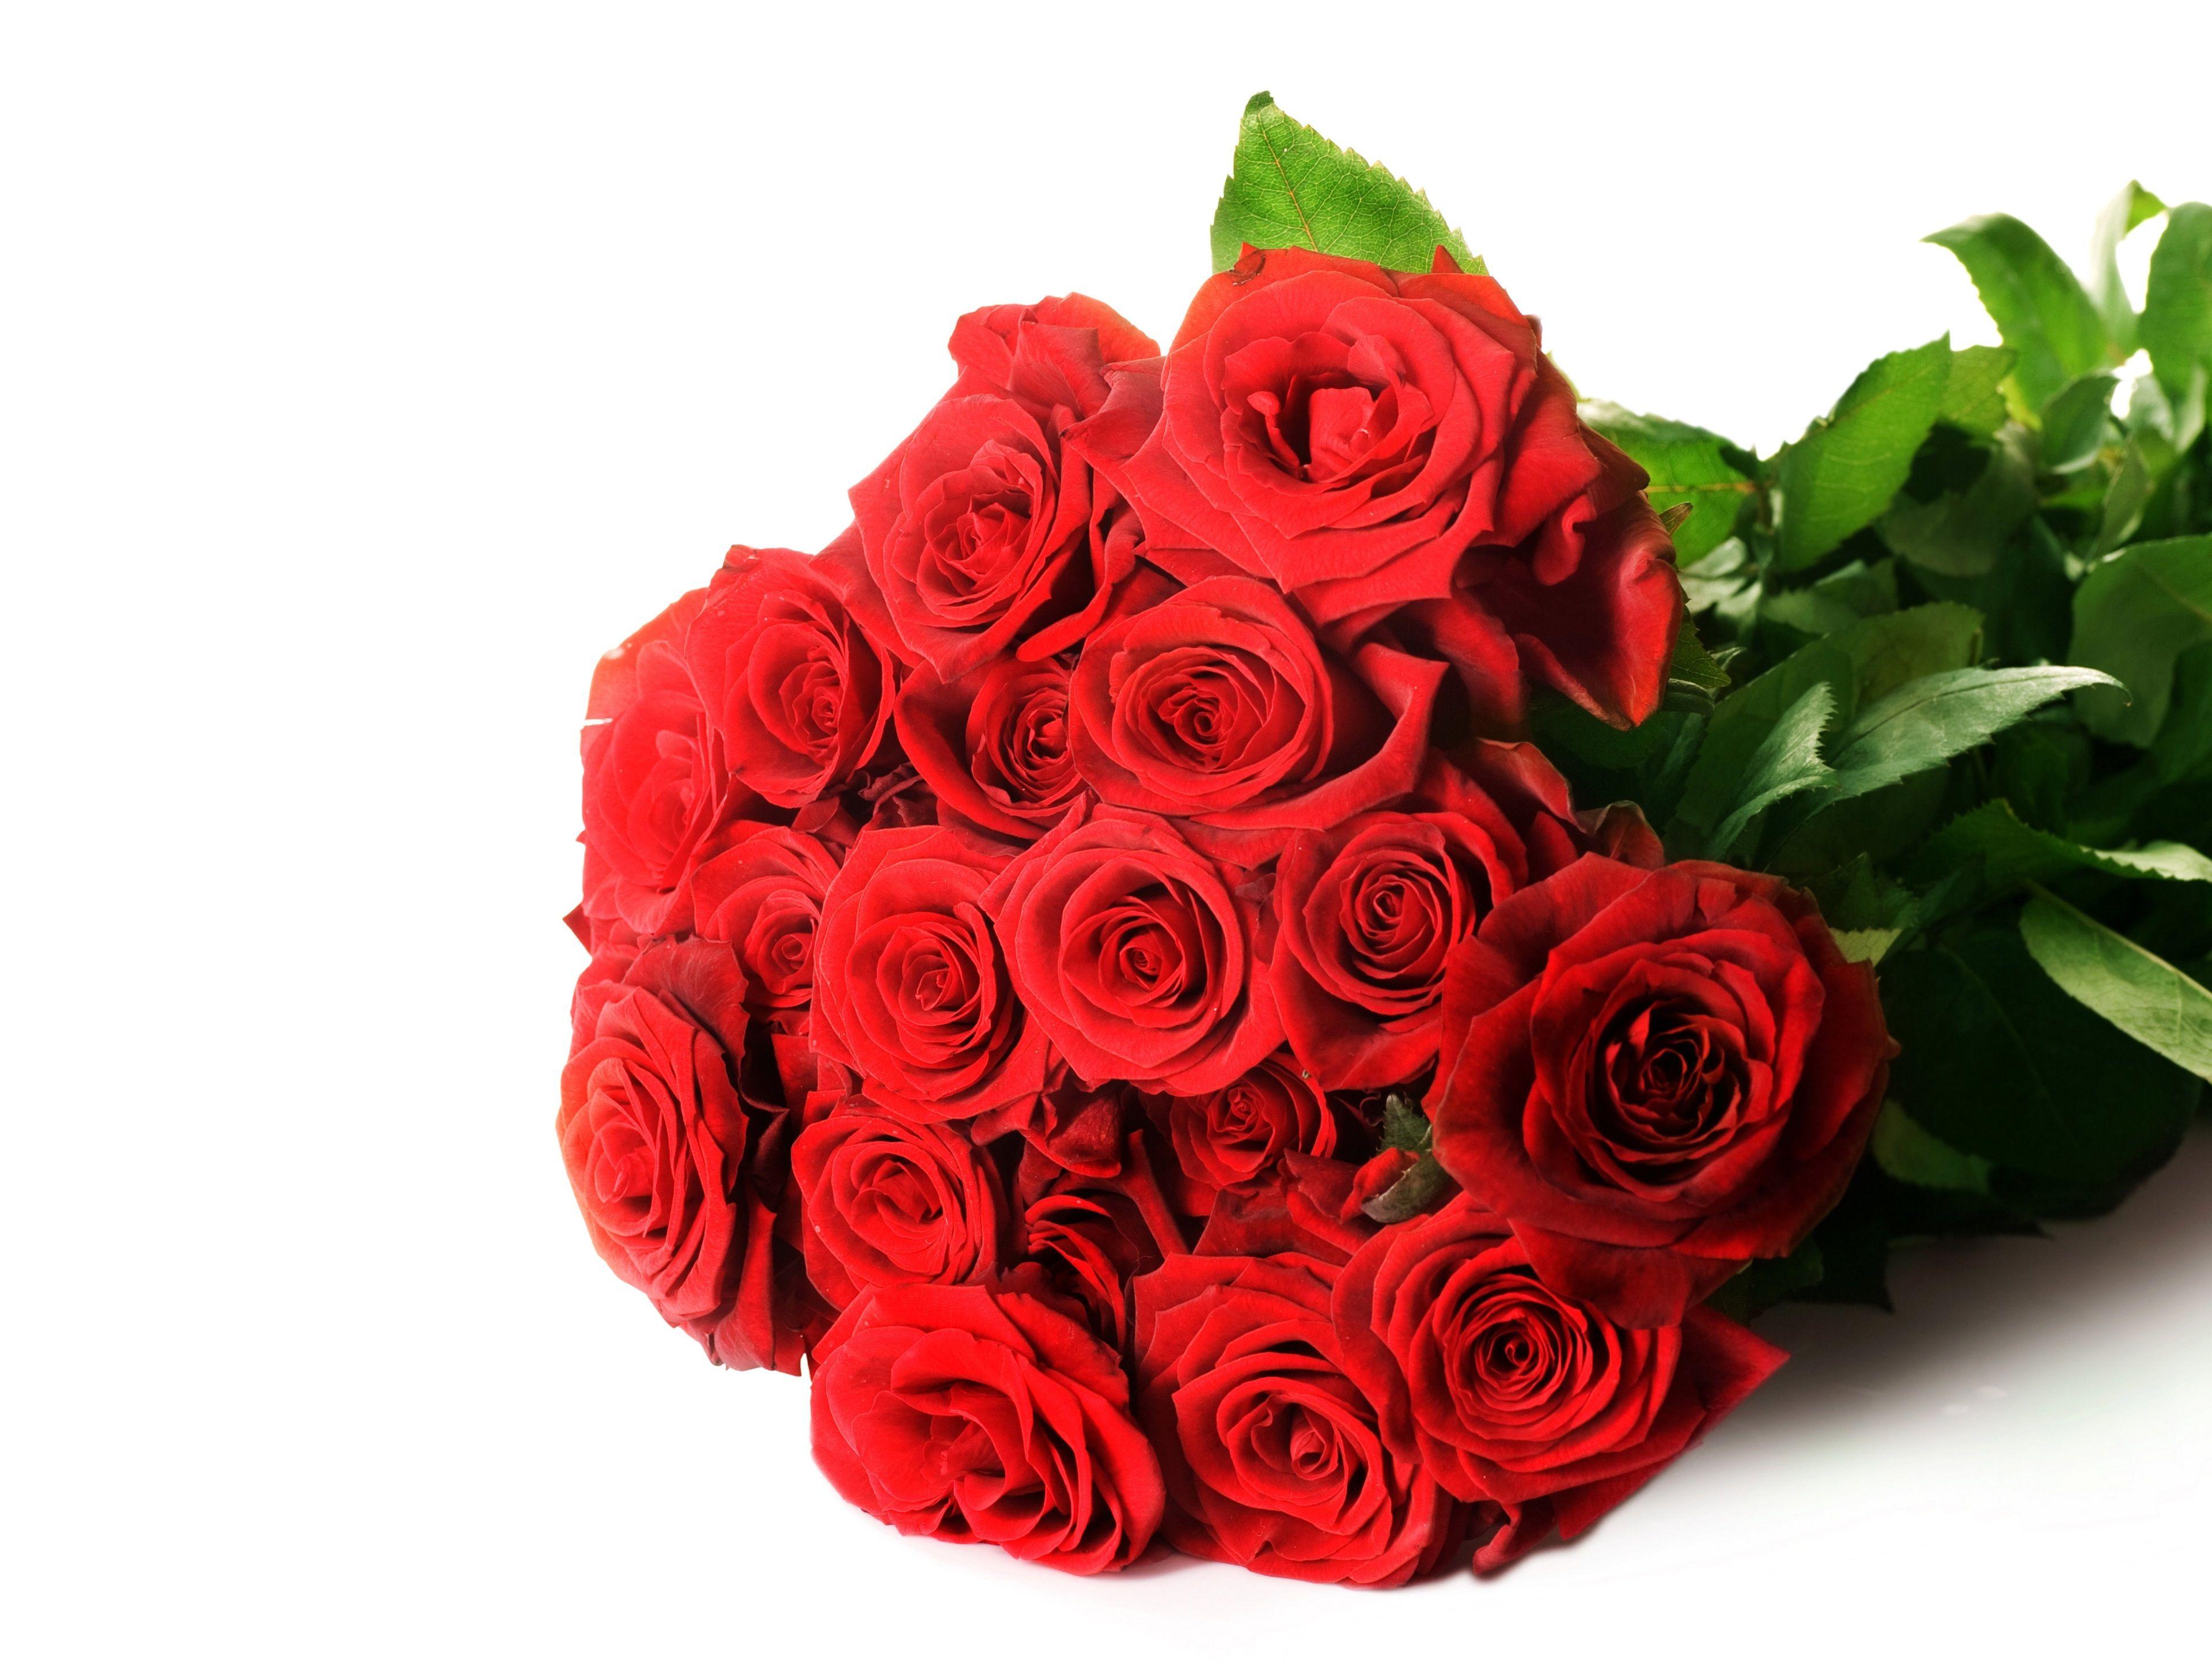 3840x2888 Red Roses 4k Hd Wallpaper For Desktop Com Imagens